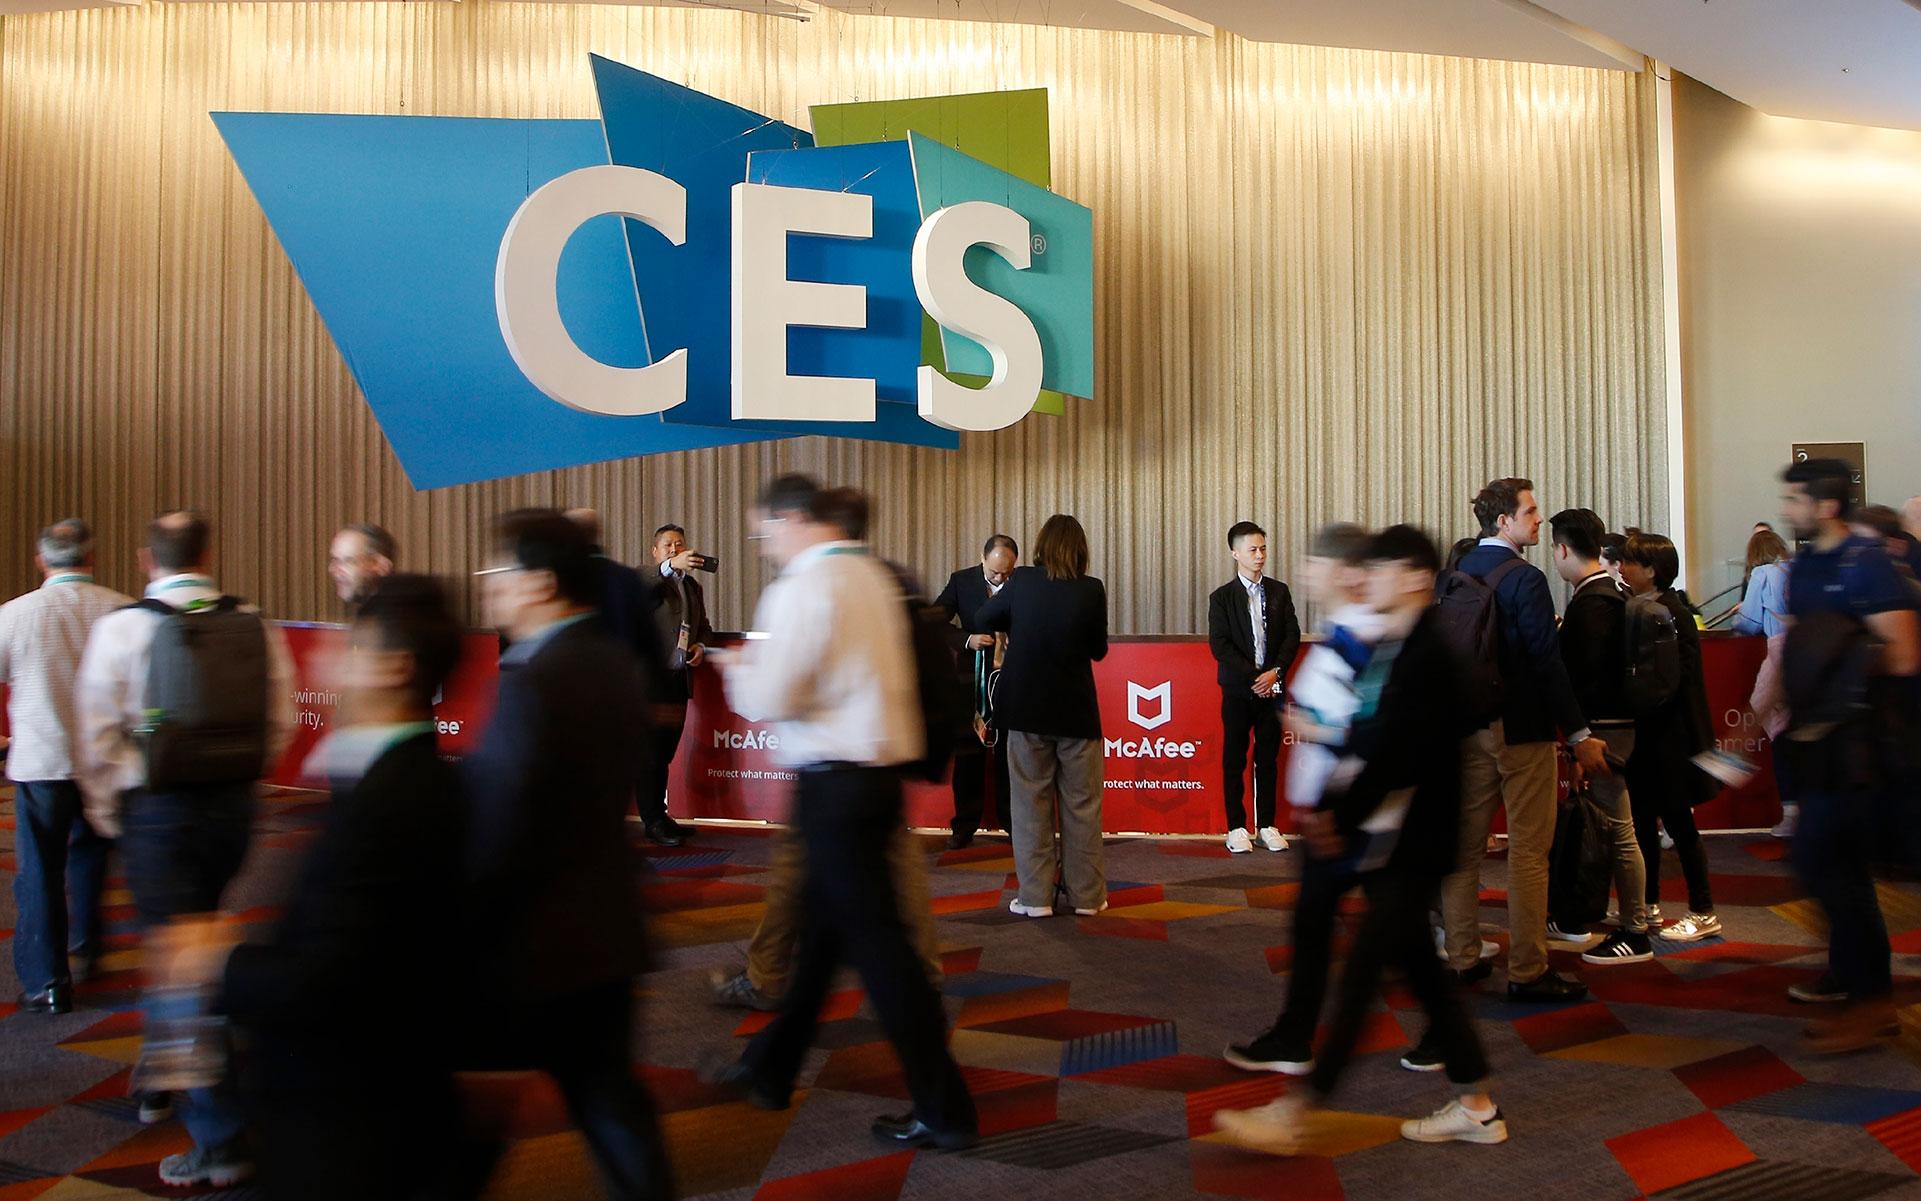 CES tech show, cannabis in tech, marijuana gadgets